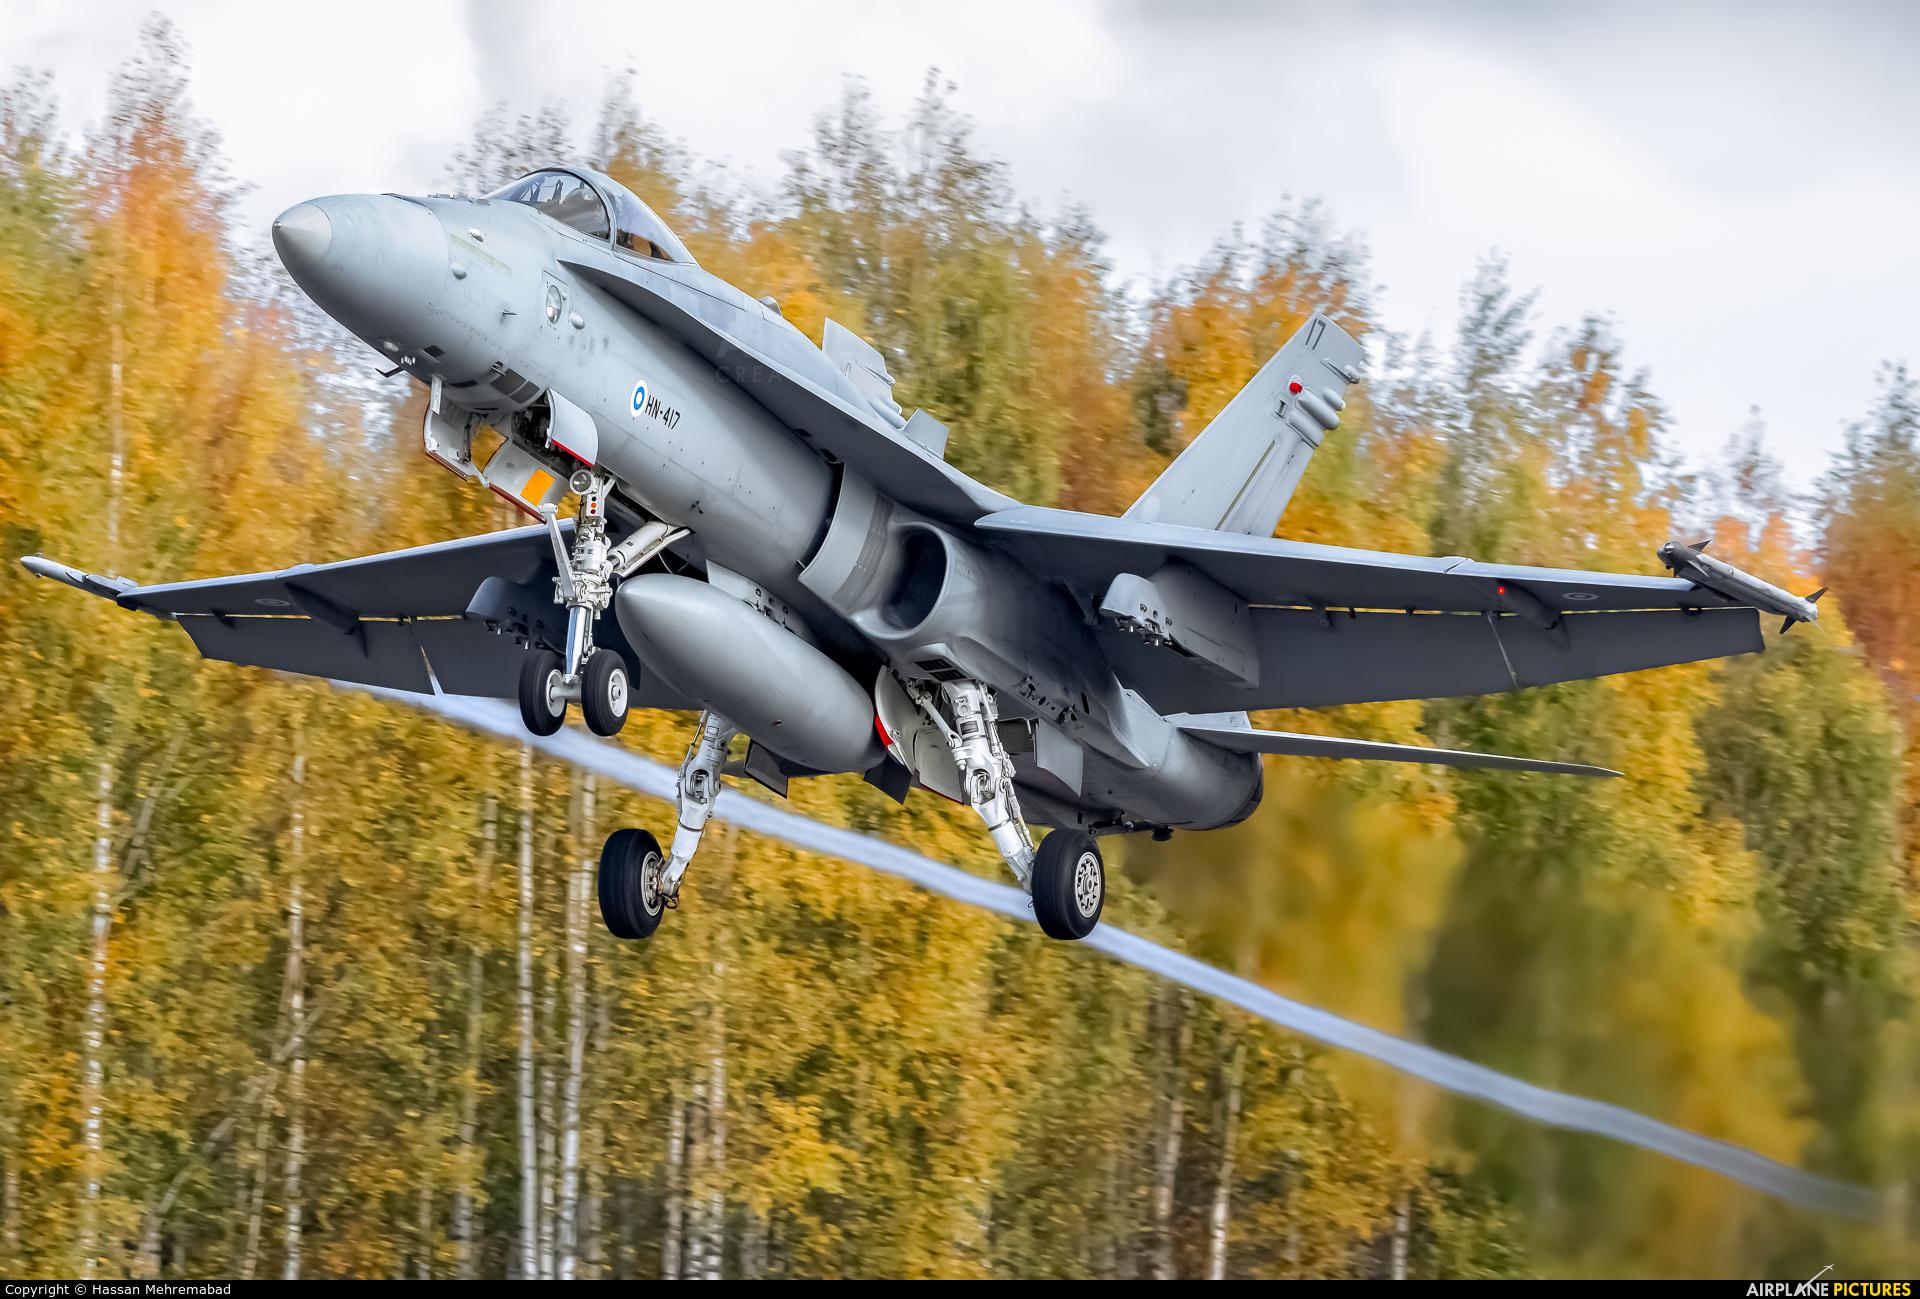 Finland - Air Force HN-417 aircraft at Off Airport - Lusi Highway Strip